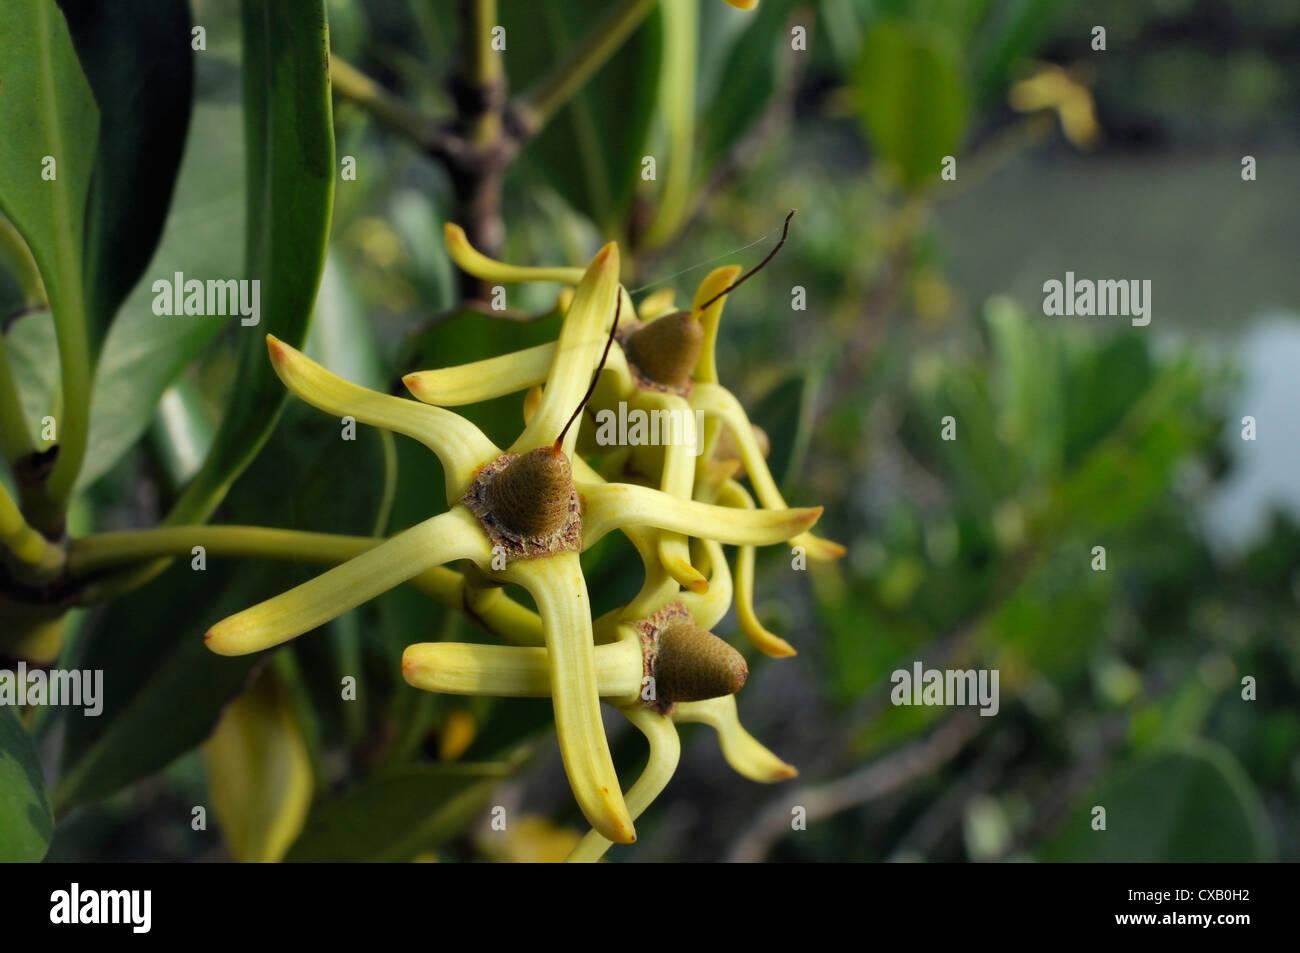 Young fruits of Mangrove tree (Kandelia candel) overhanging tidal creek, Guandu Nature Park, Taiwan, Asia - Stock Image